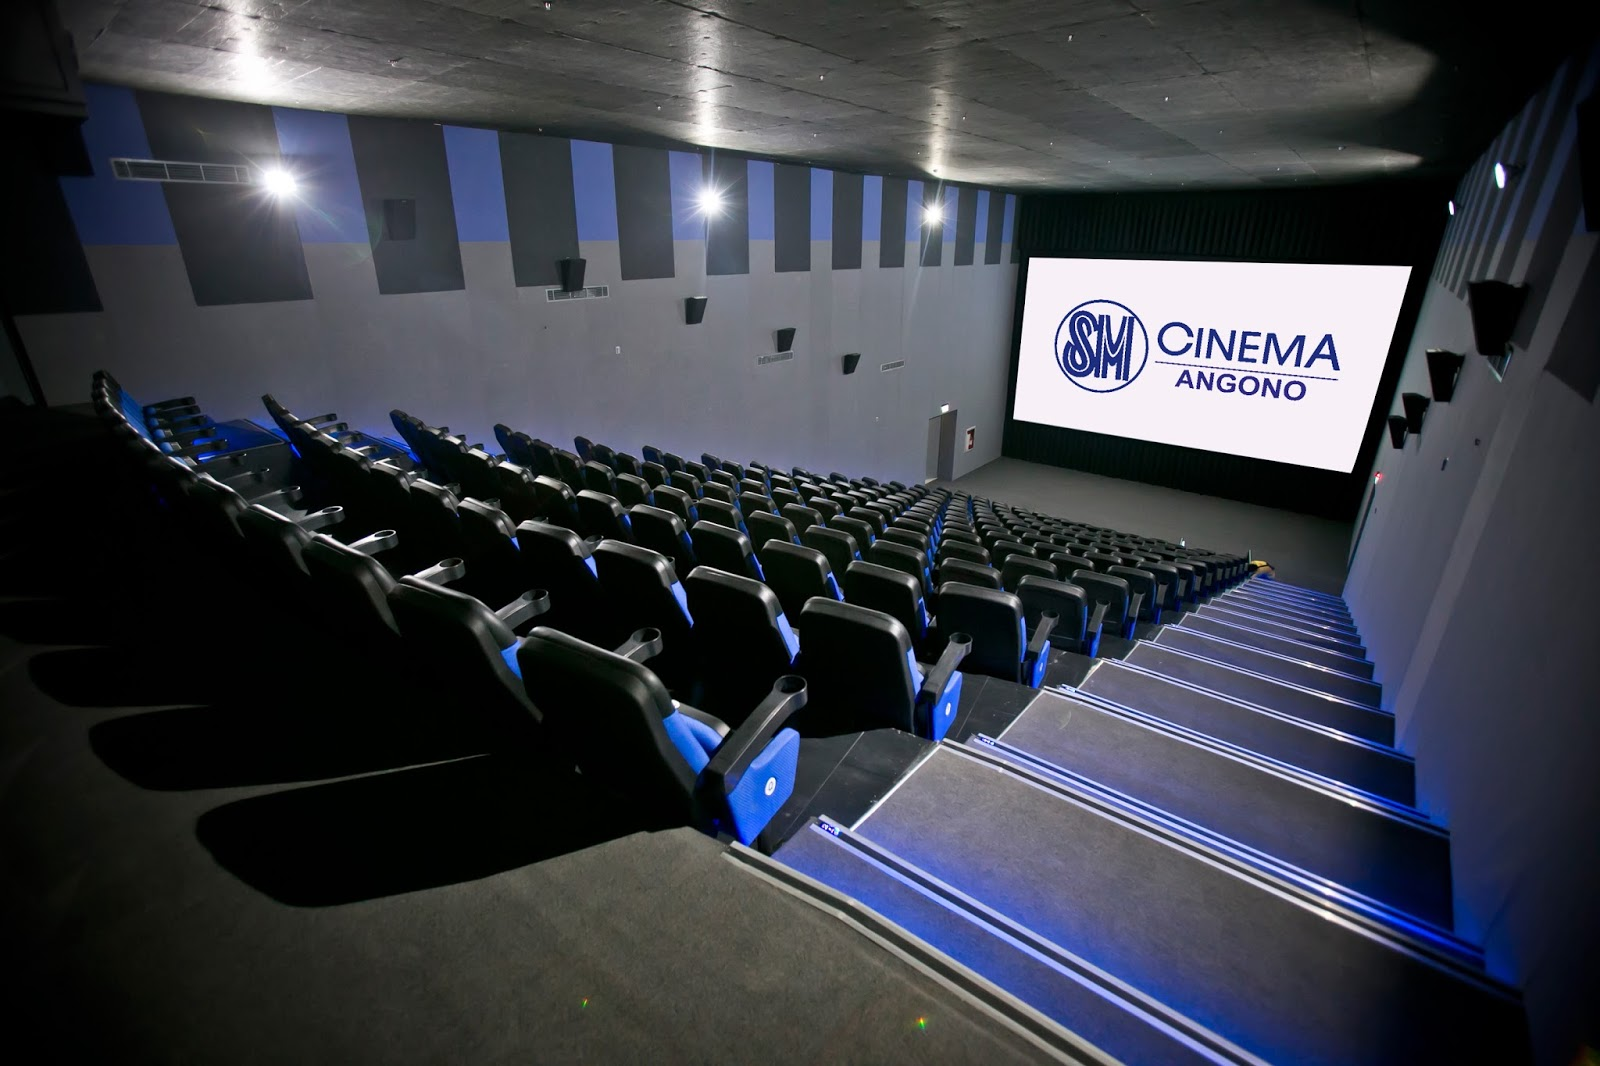 Cinema Center sm center angono opens 4 cinemas the memet diaries